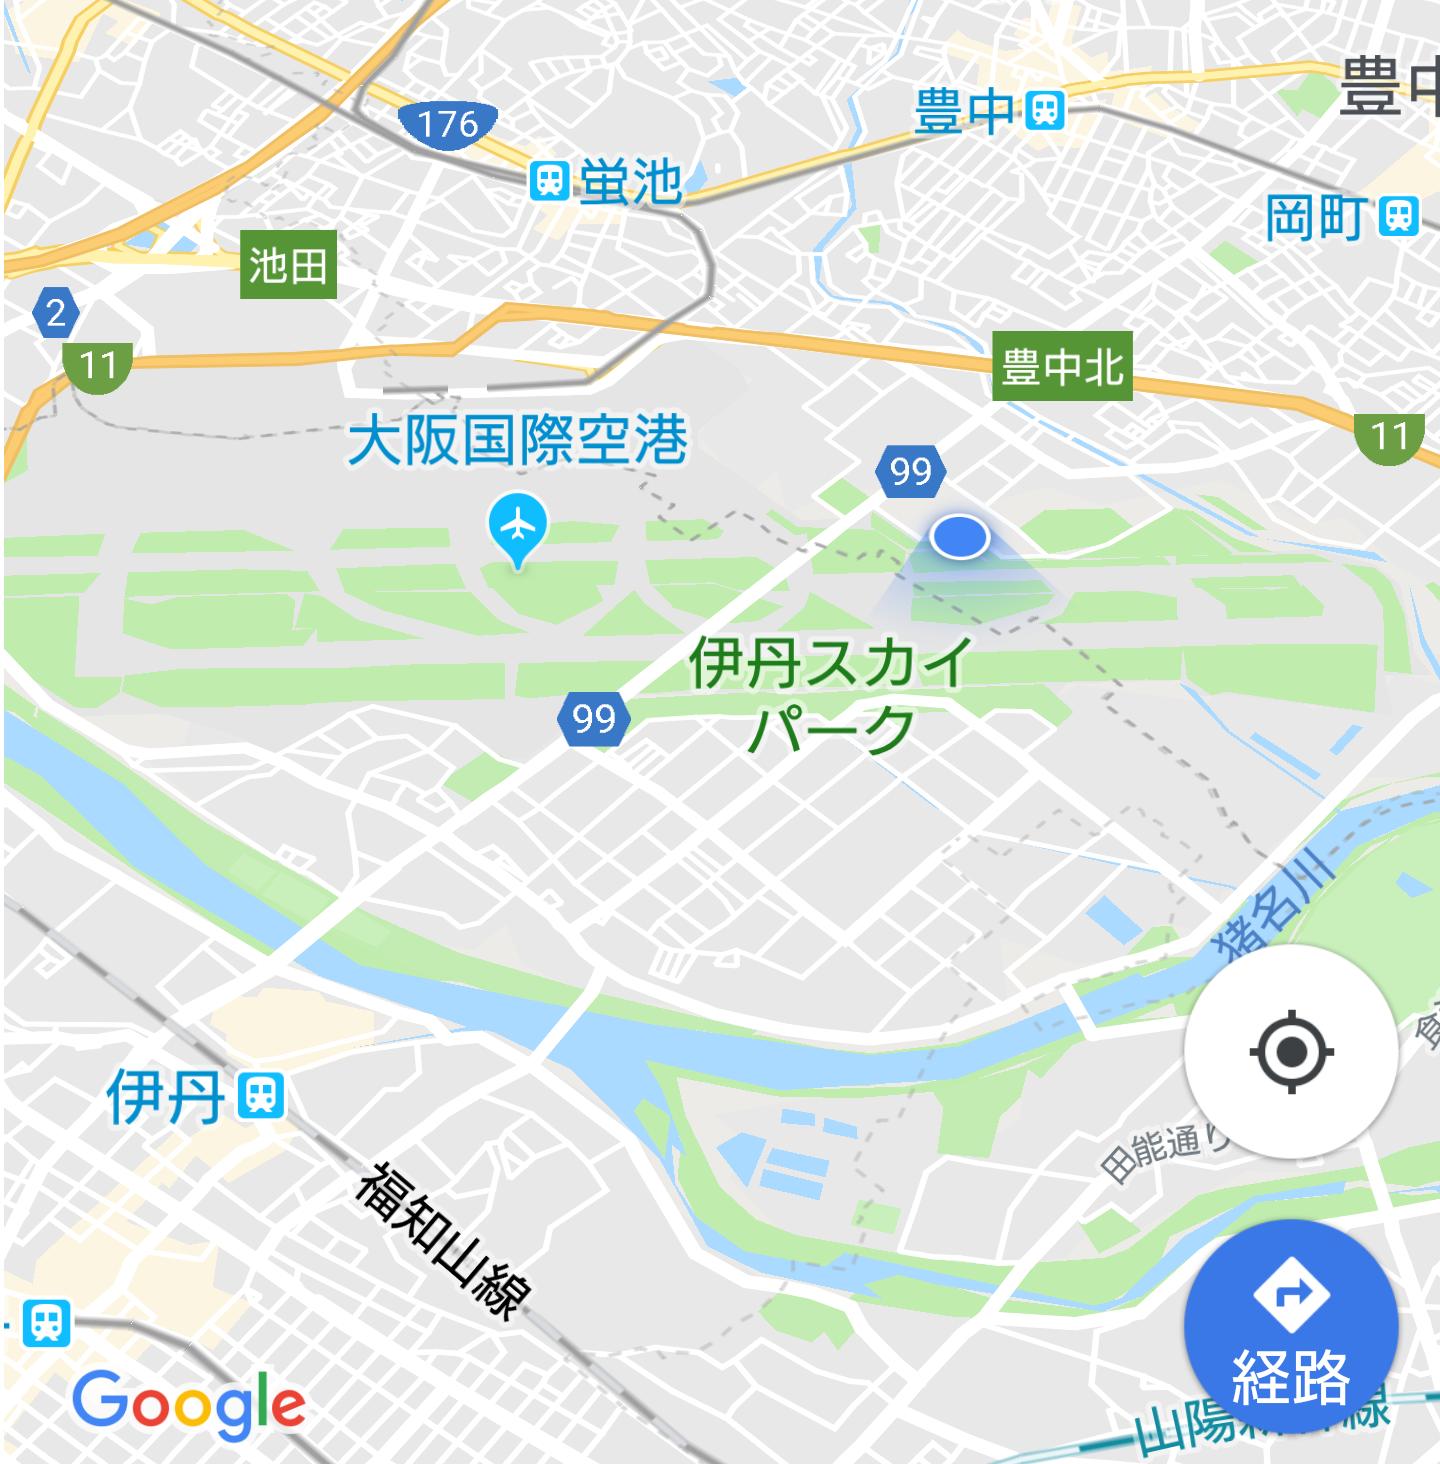 6Screenshot_20190627-174434.png